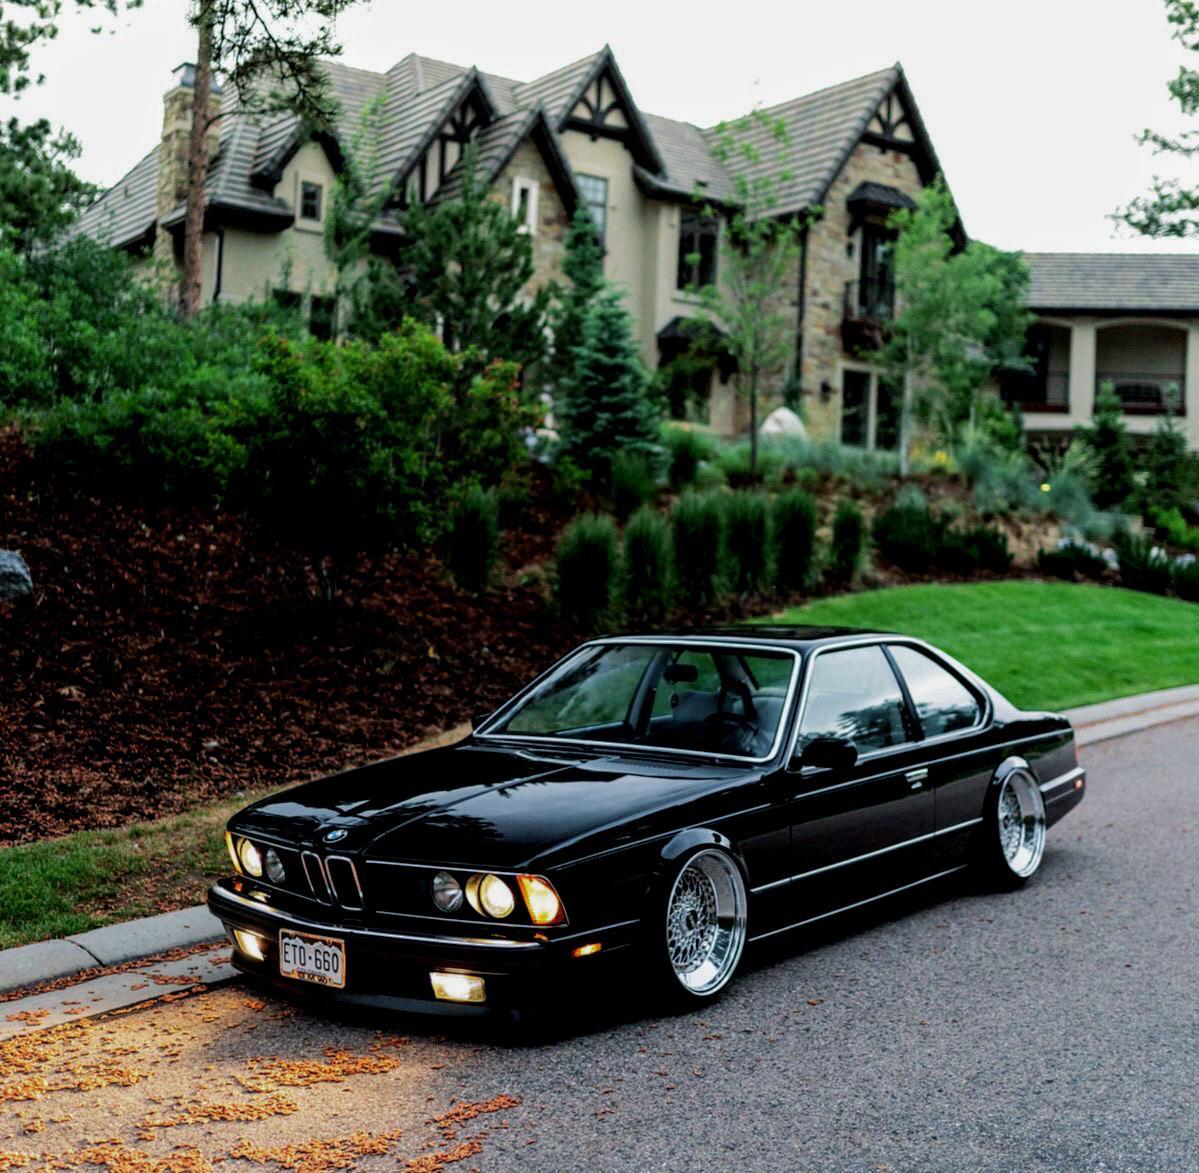 Stunning Black BMW M6